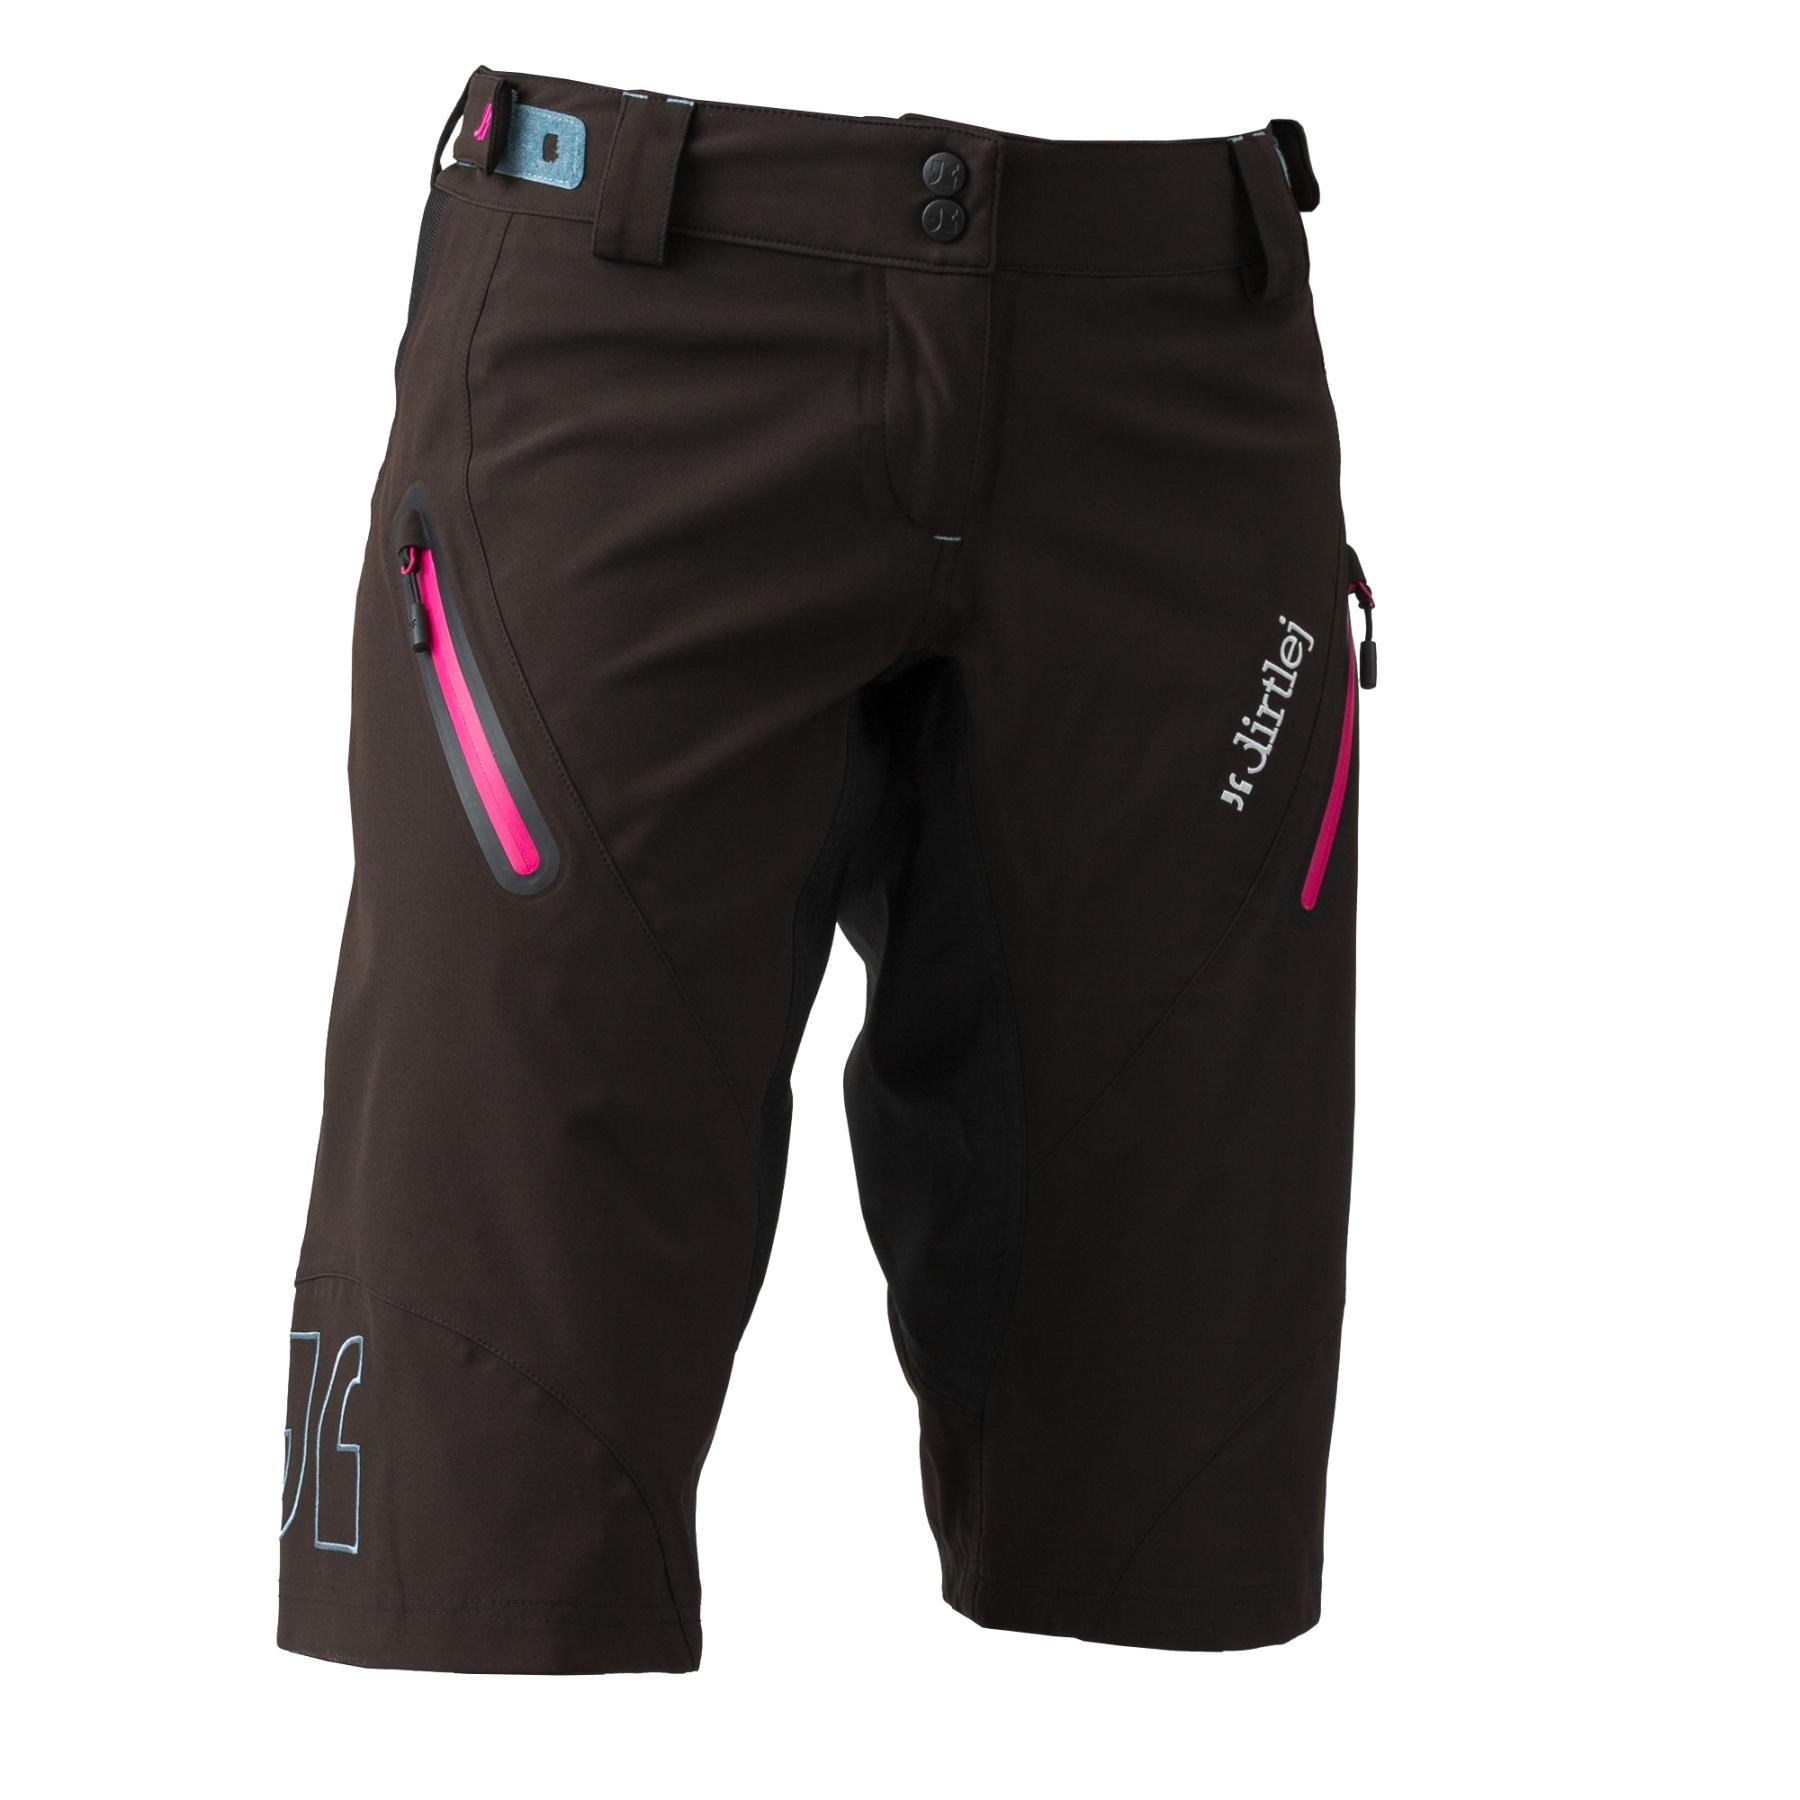 Foto de Dirtlej Trailscout Waterproof Pantalones para mujer - black/pink